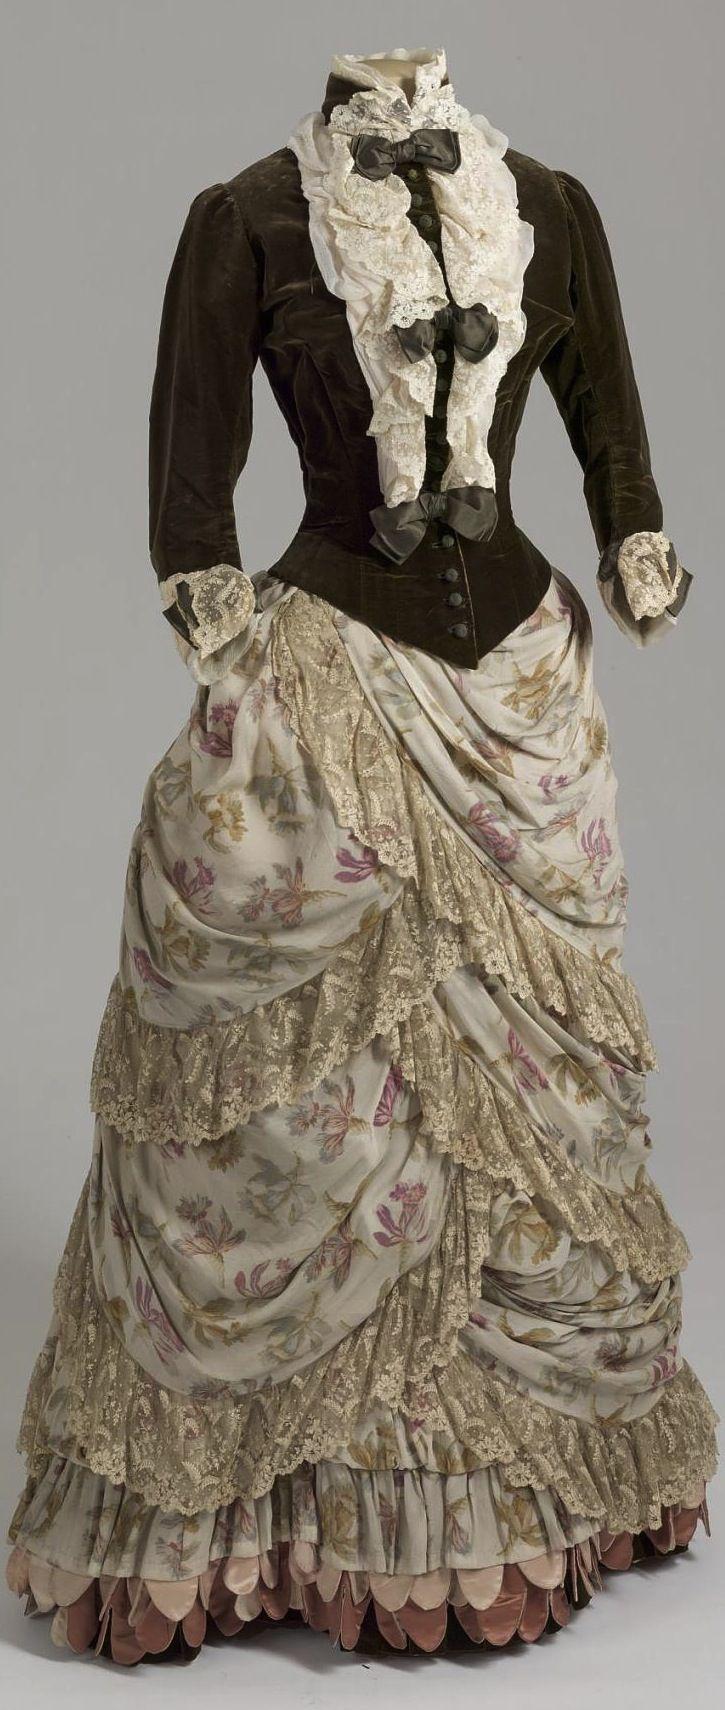 Visiting dress belonging to empress maria fyodorovna russia